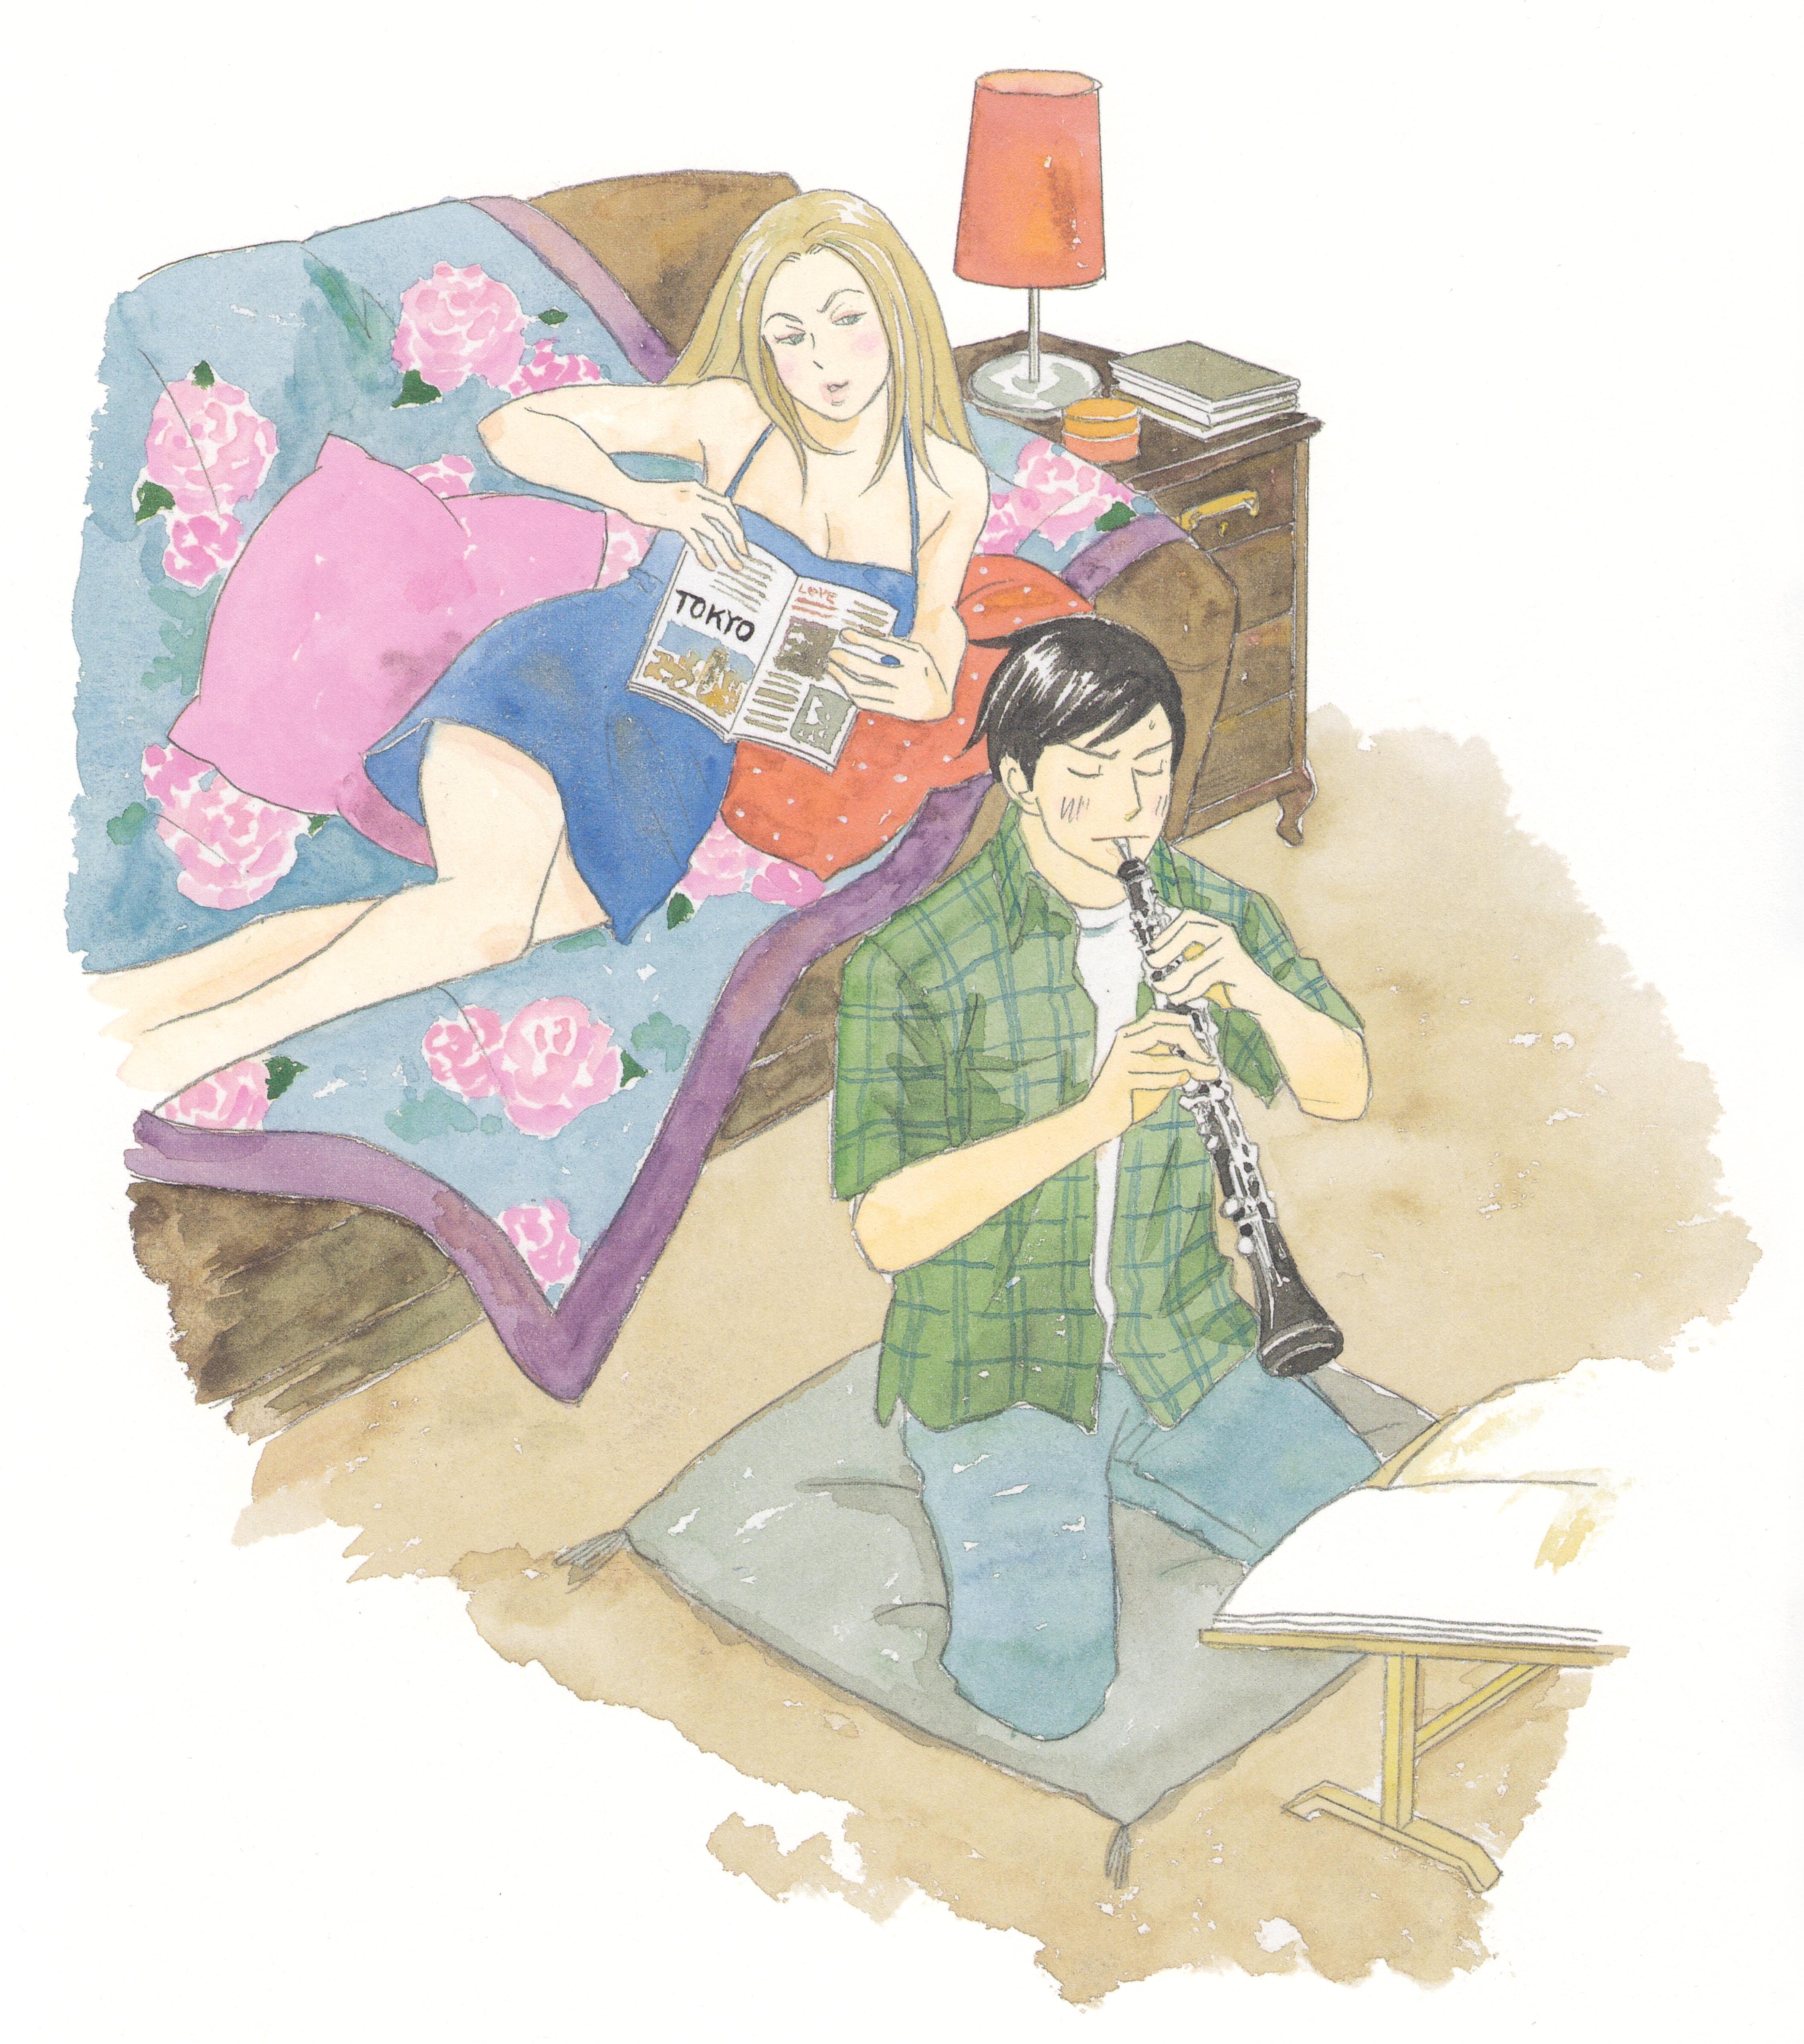 Nodame Cantabile Ninomiya Tomoko: Nodame Cantabile: Nodame Illustrations P.55